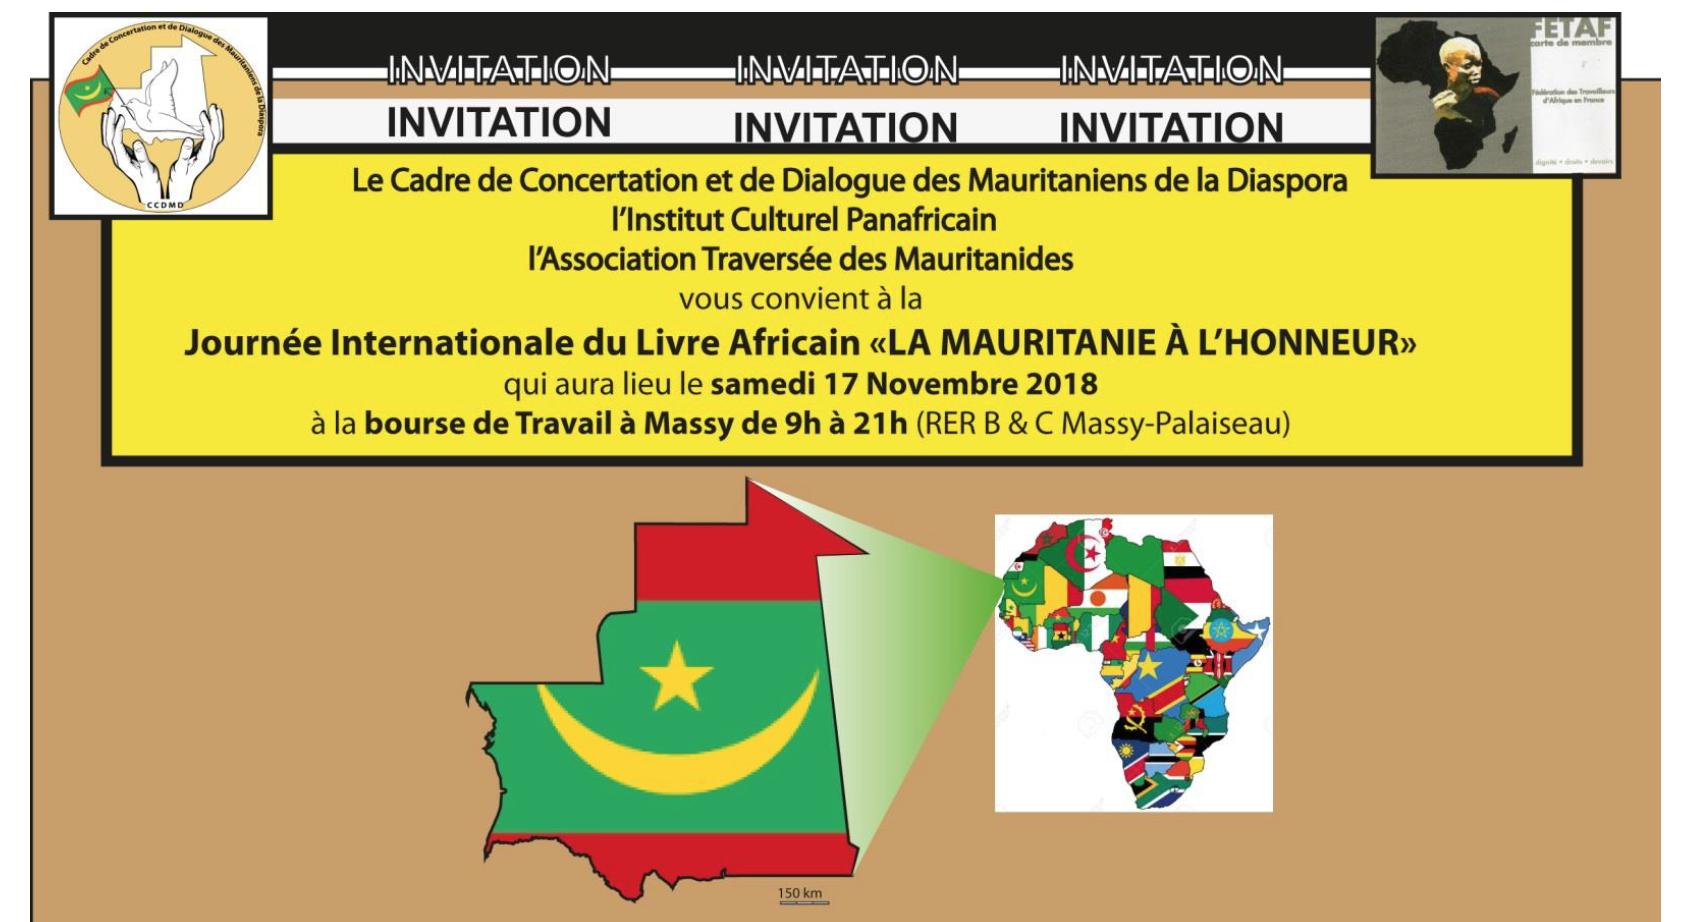 Journée Internationale du Livre africain